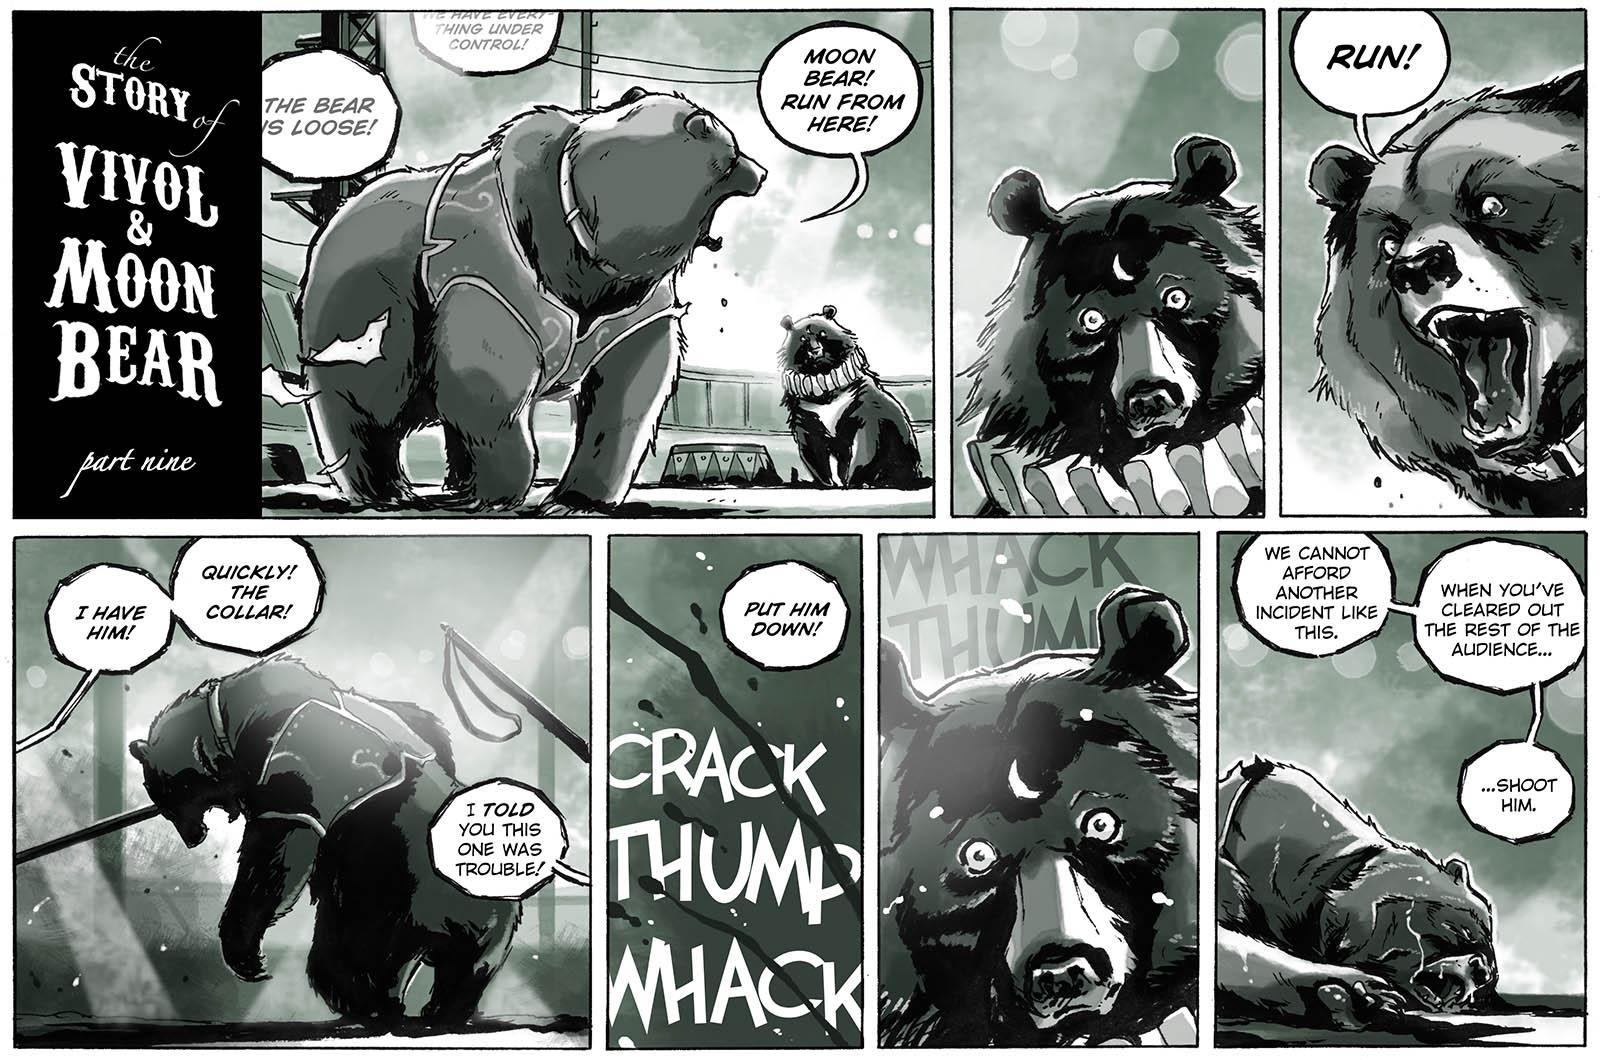 The Story of Vivol & Moon Bear – part nine